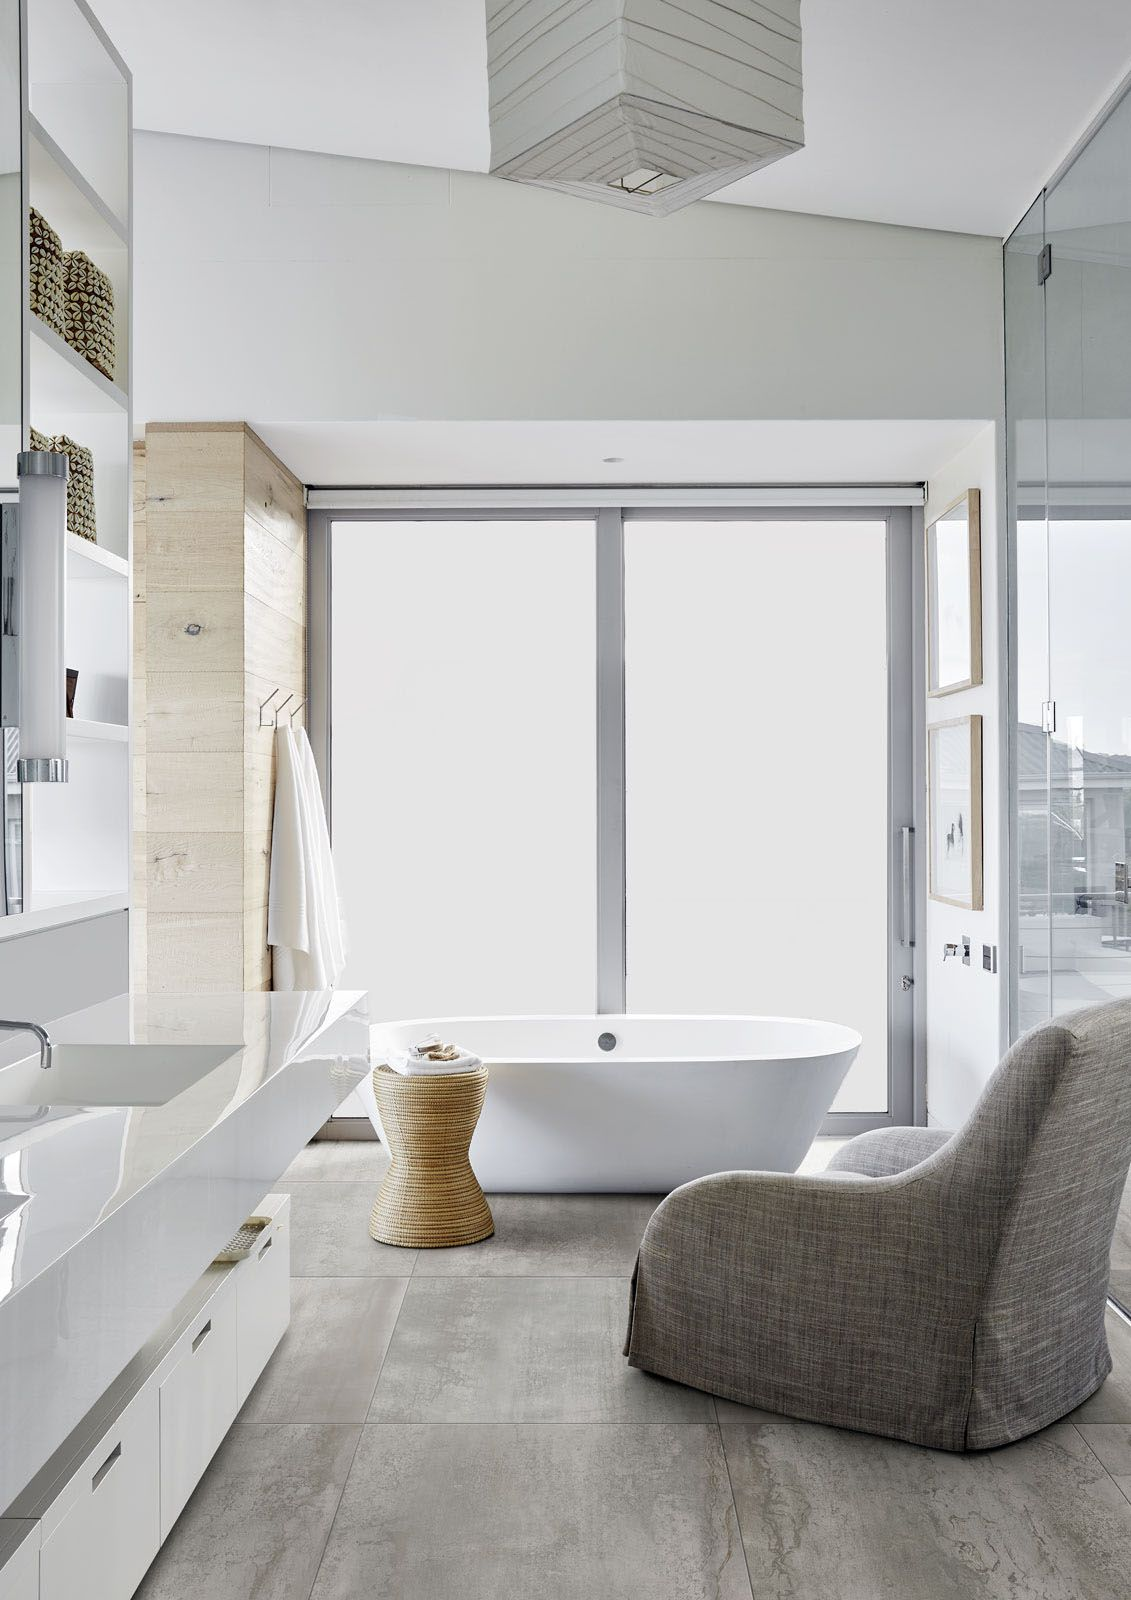 Bathroom tiles: ceramic and porcelain stoneware - Marazzi 8671 ...